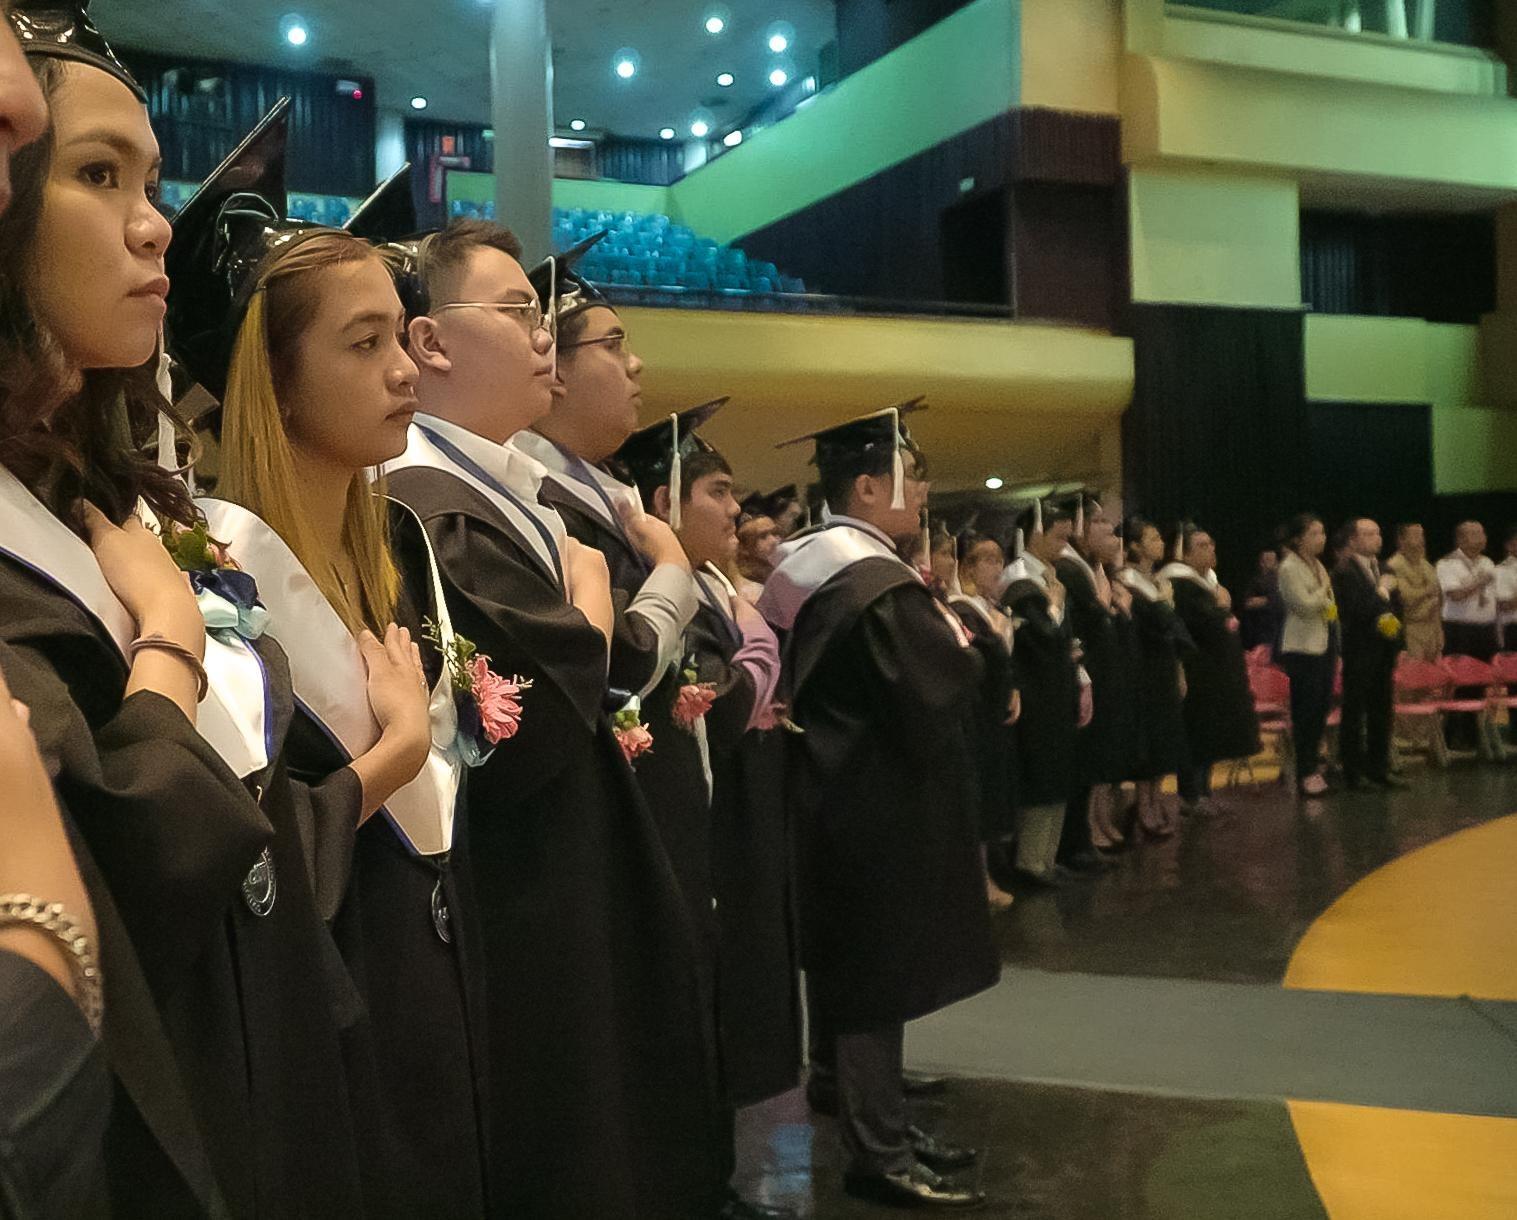 CIIT Commencement Ceremony: The Graduates of Batch 2018